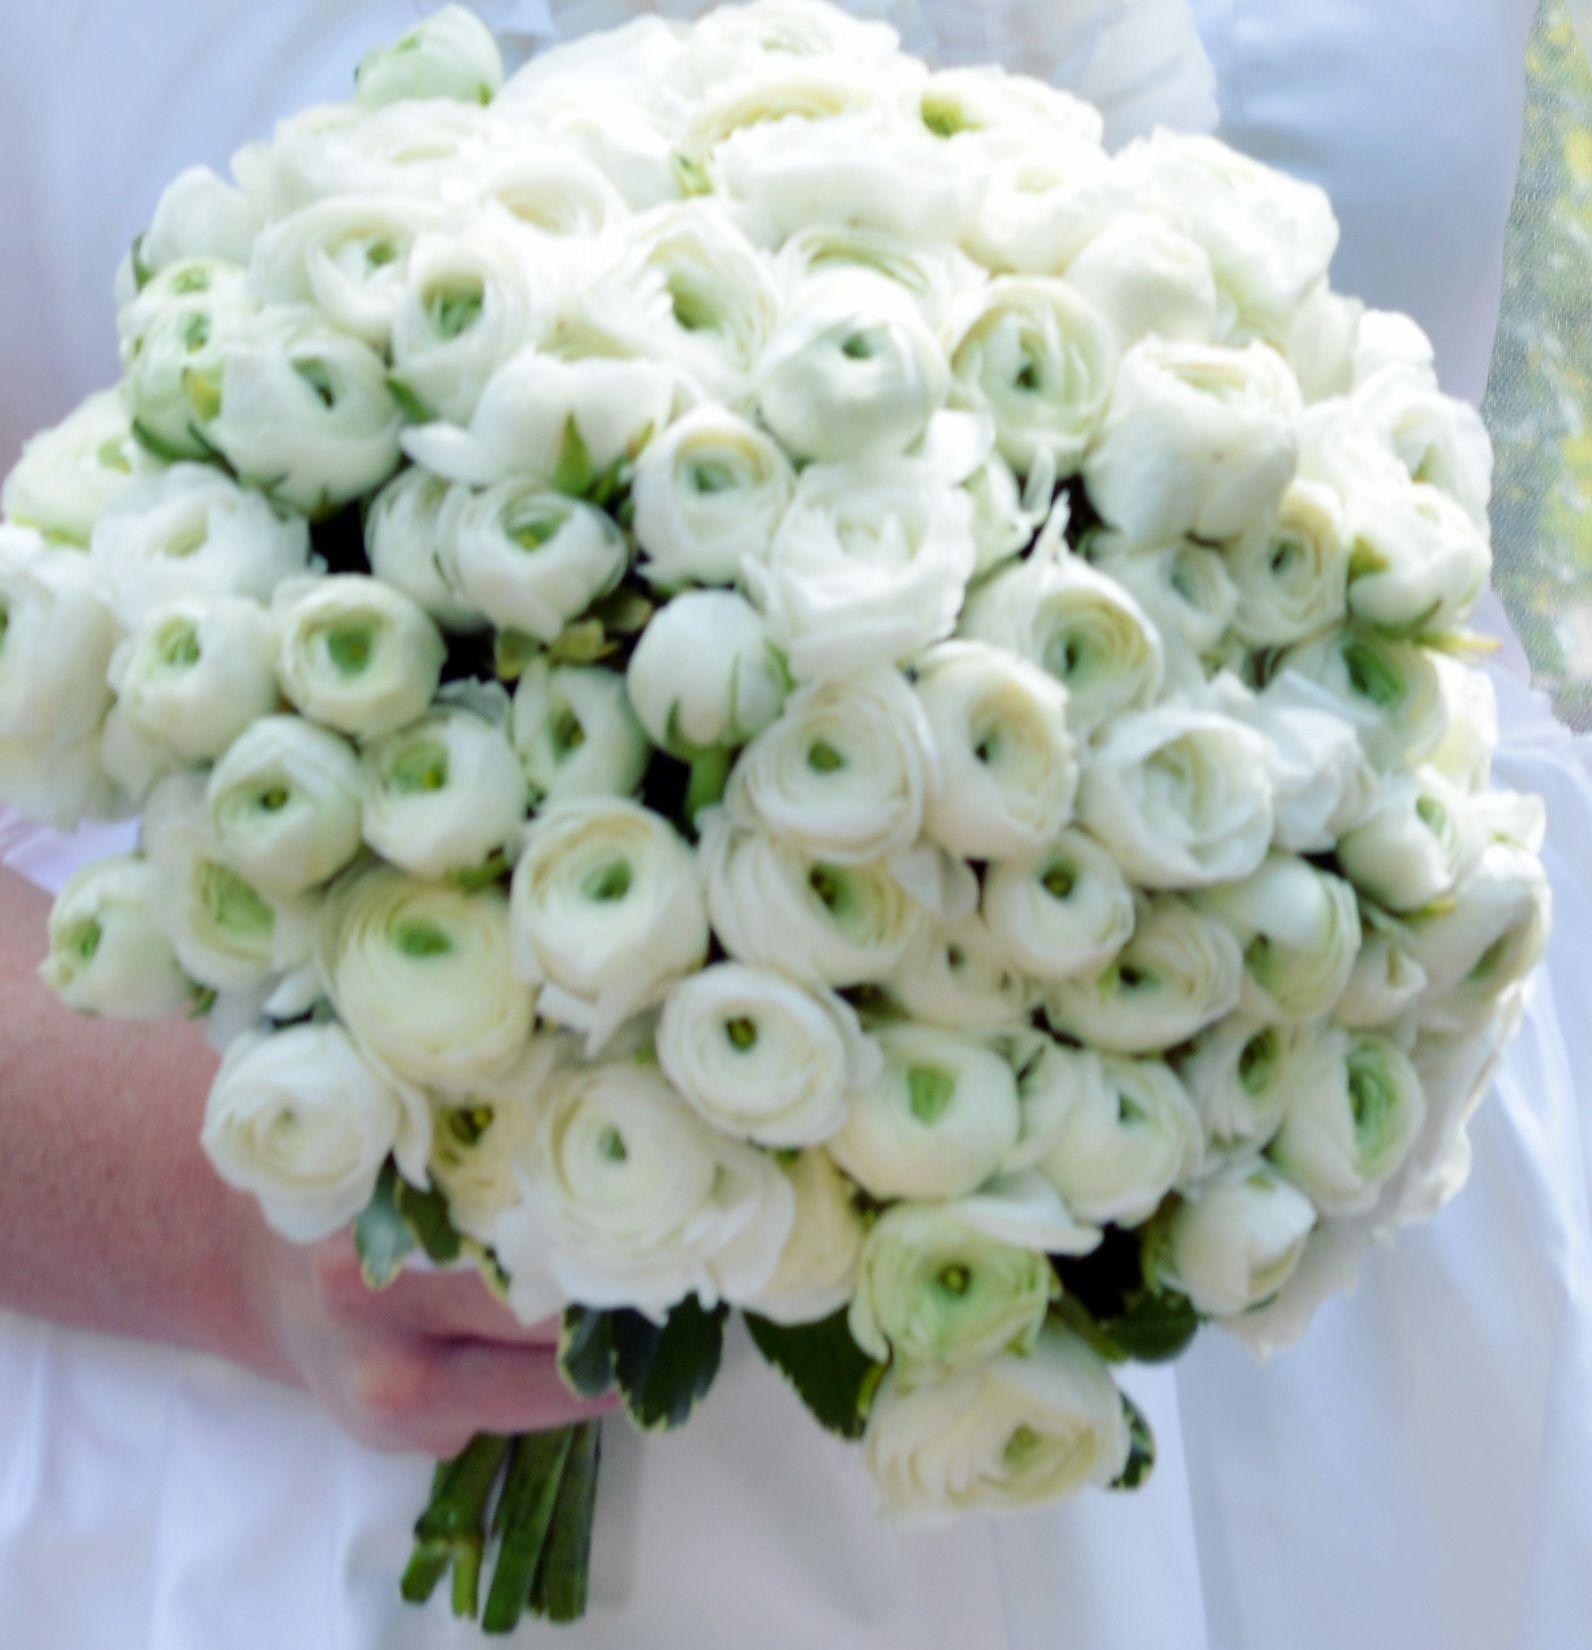 White ranunculus wedding bouquet don t tell doug flowers